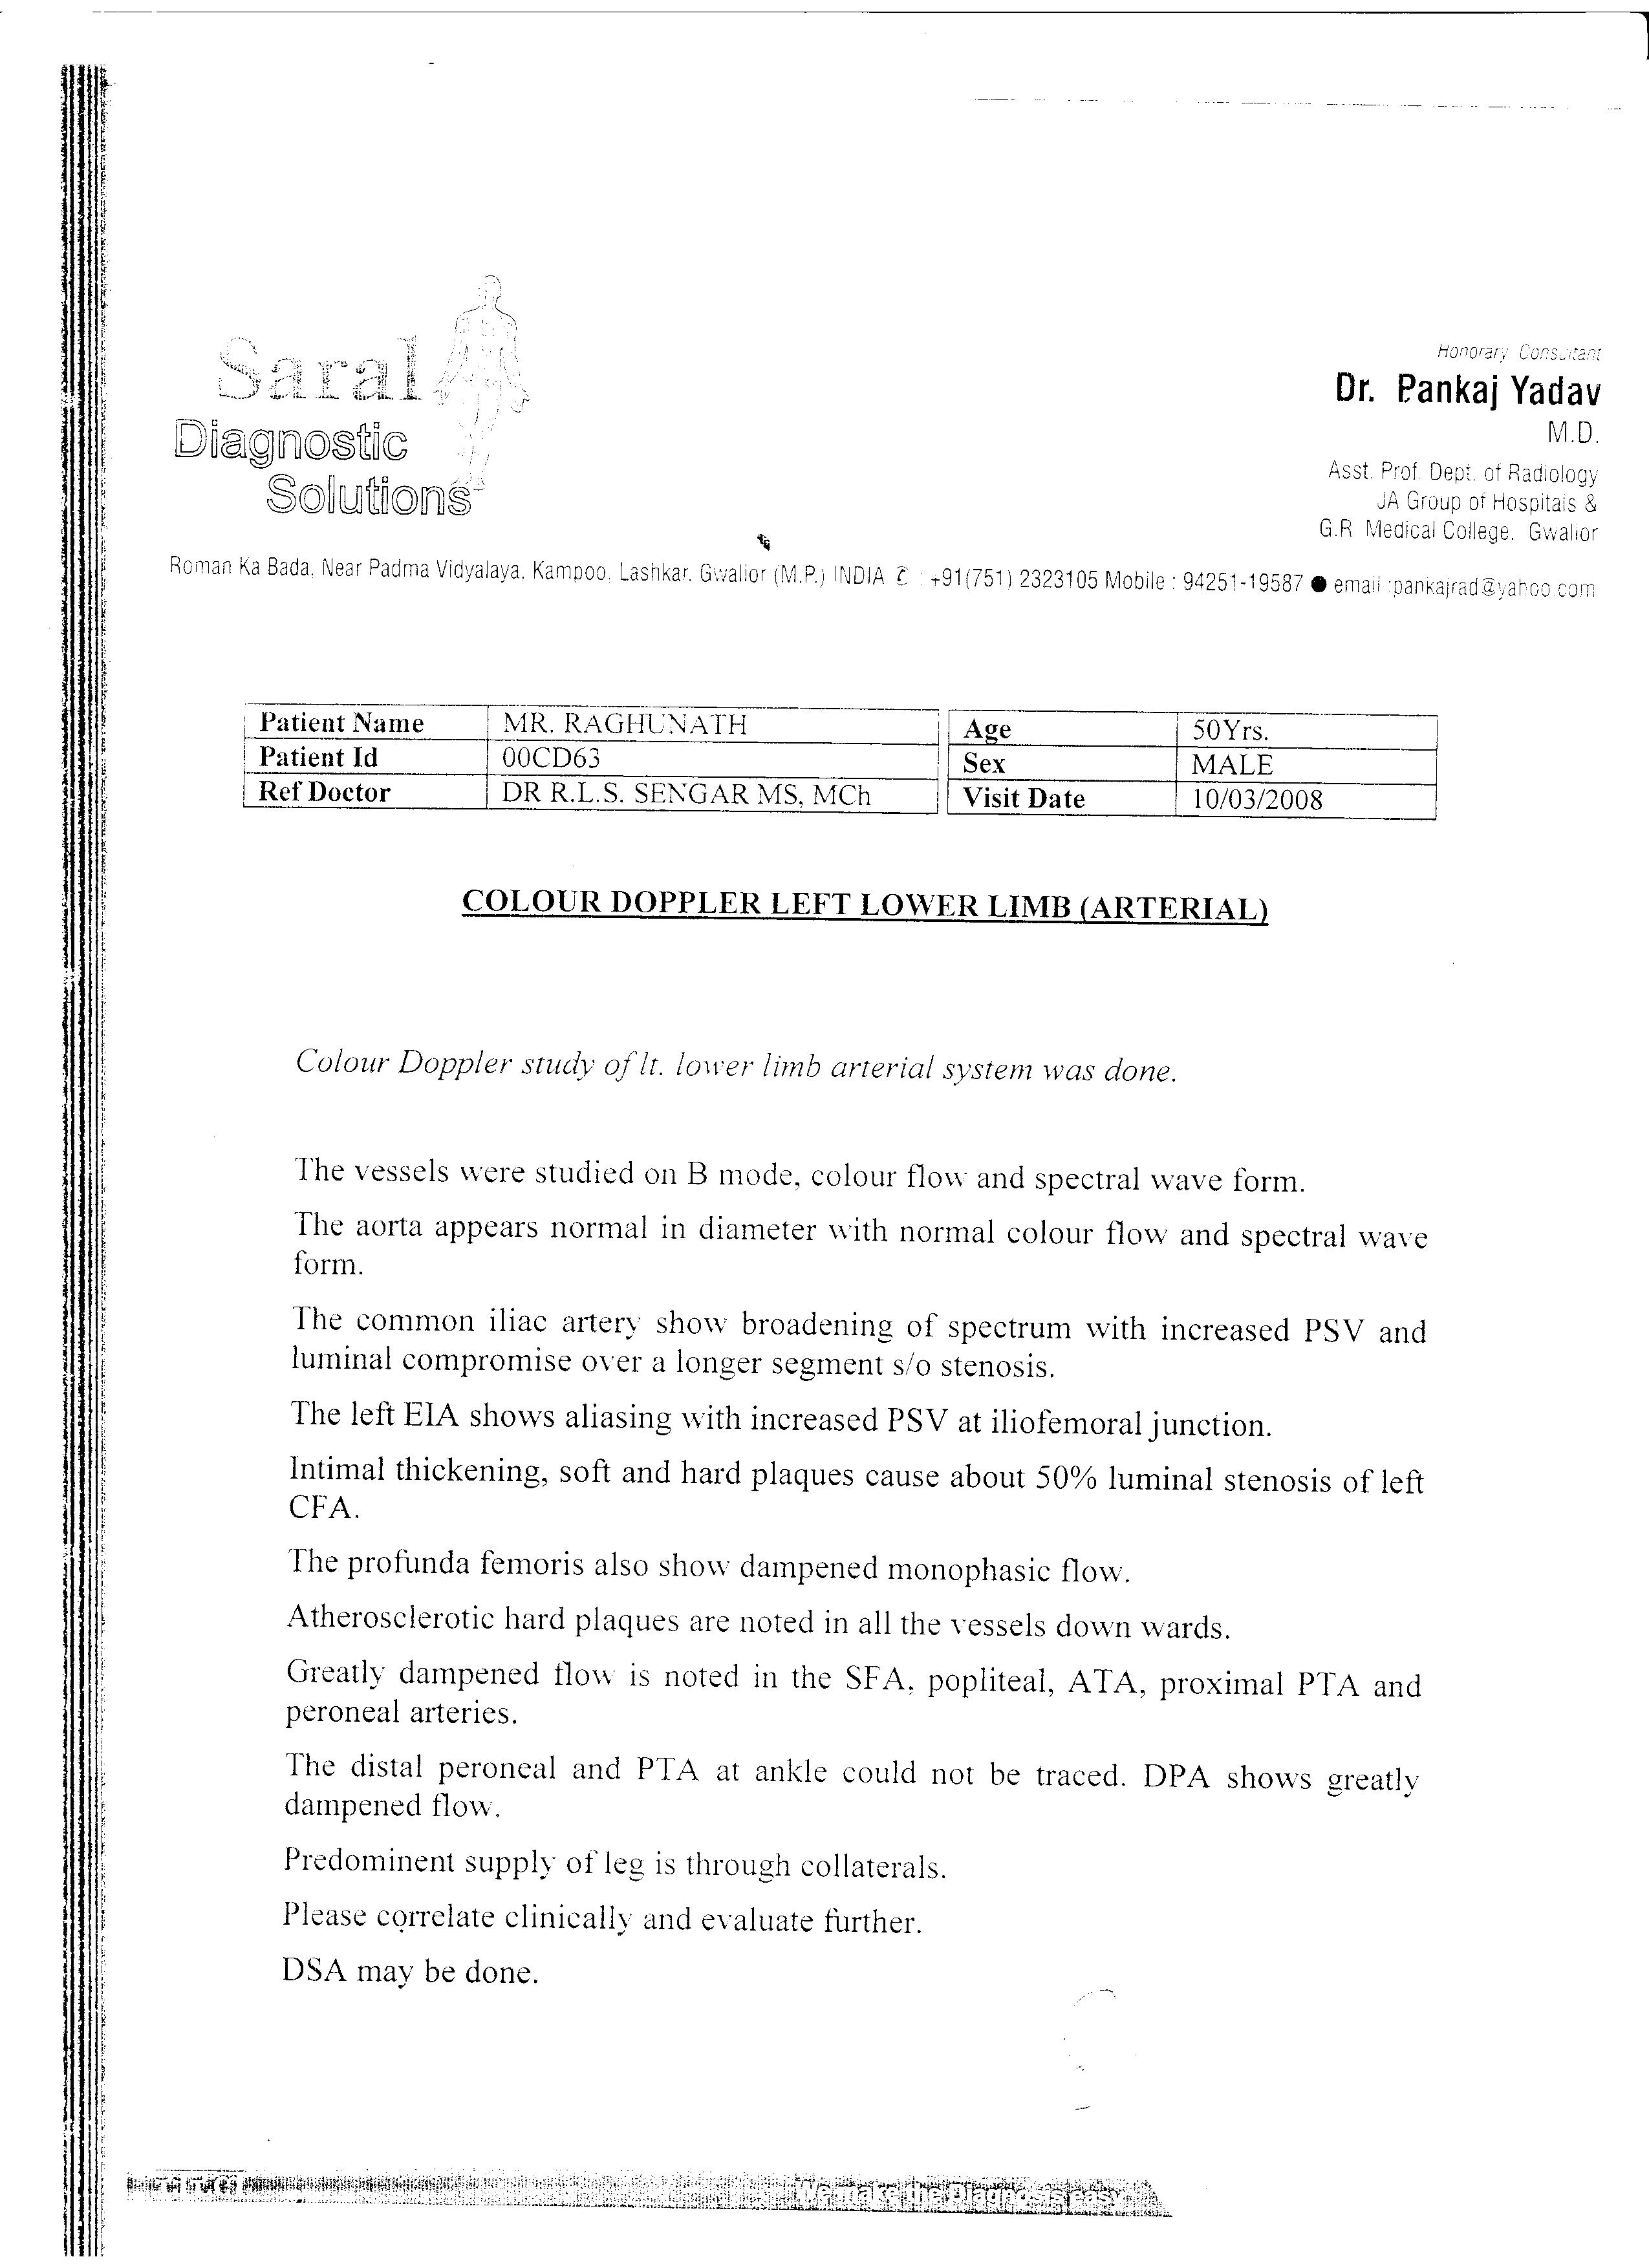 RAGHUNATH-SINGH-KAURAV-57-Yrs-DVT-treatment-4